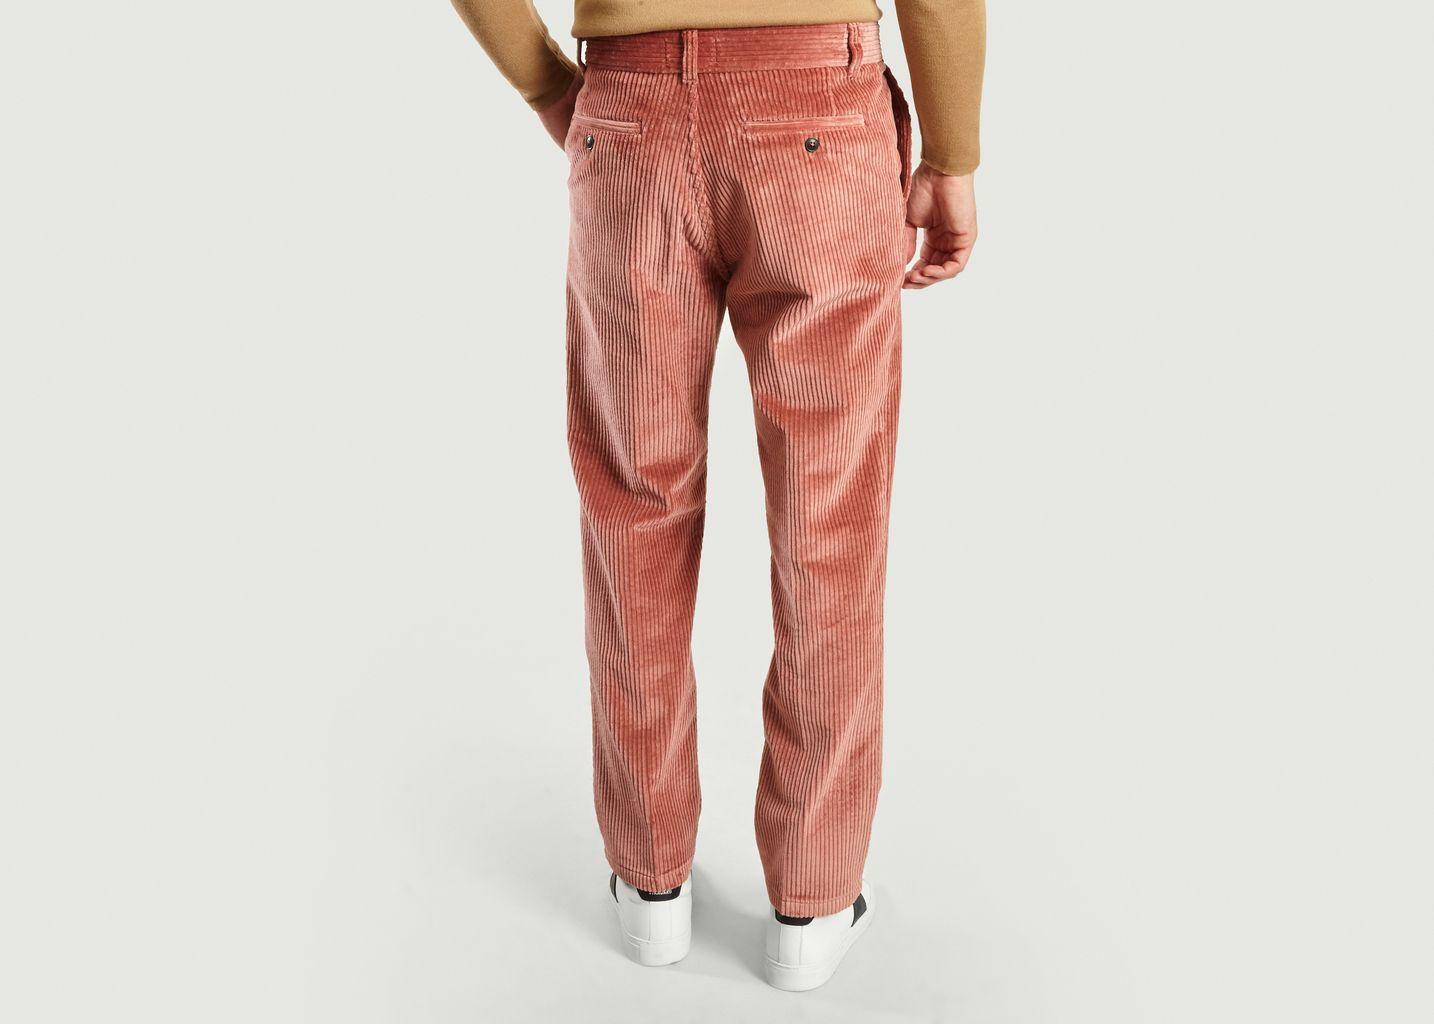 Pantalon Coupe Droite en Velours Rose - AMI Alexandre Mattiussi